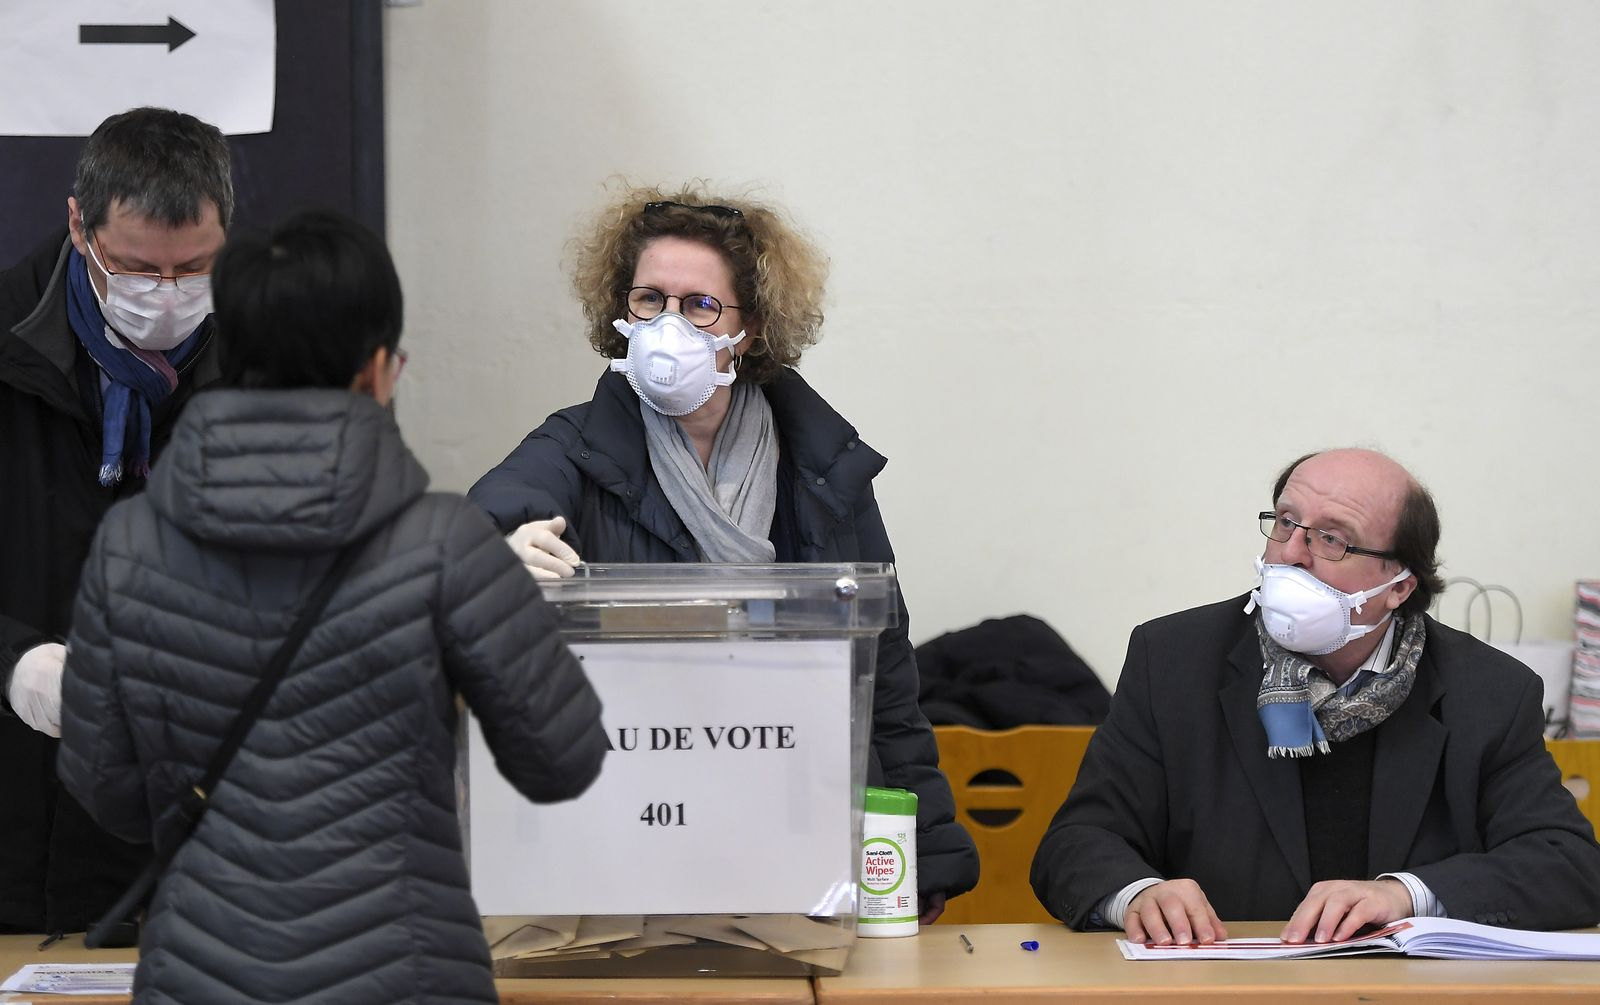 FRANCE-POLITICS-VOTE-MAYOR-2020-VIRUS